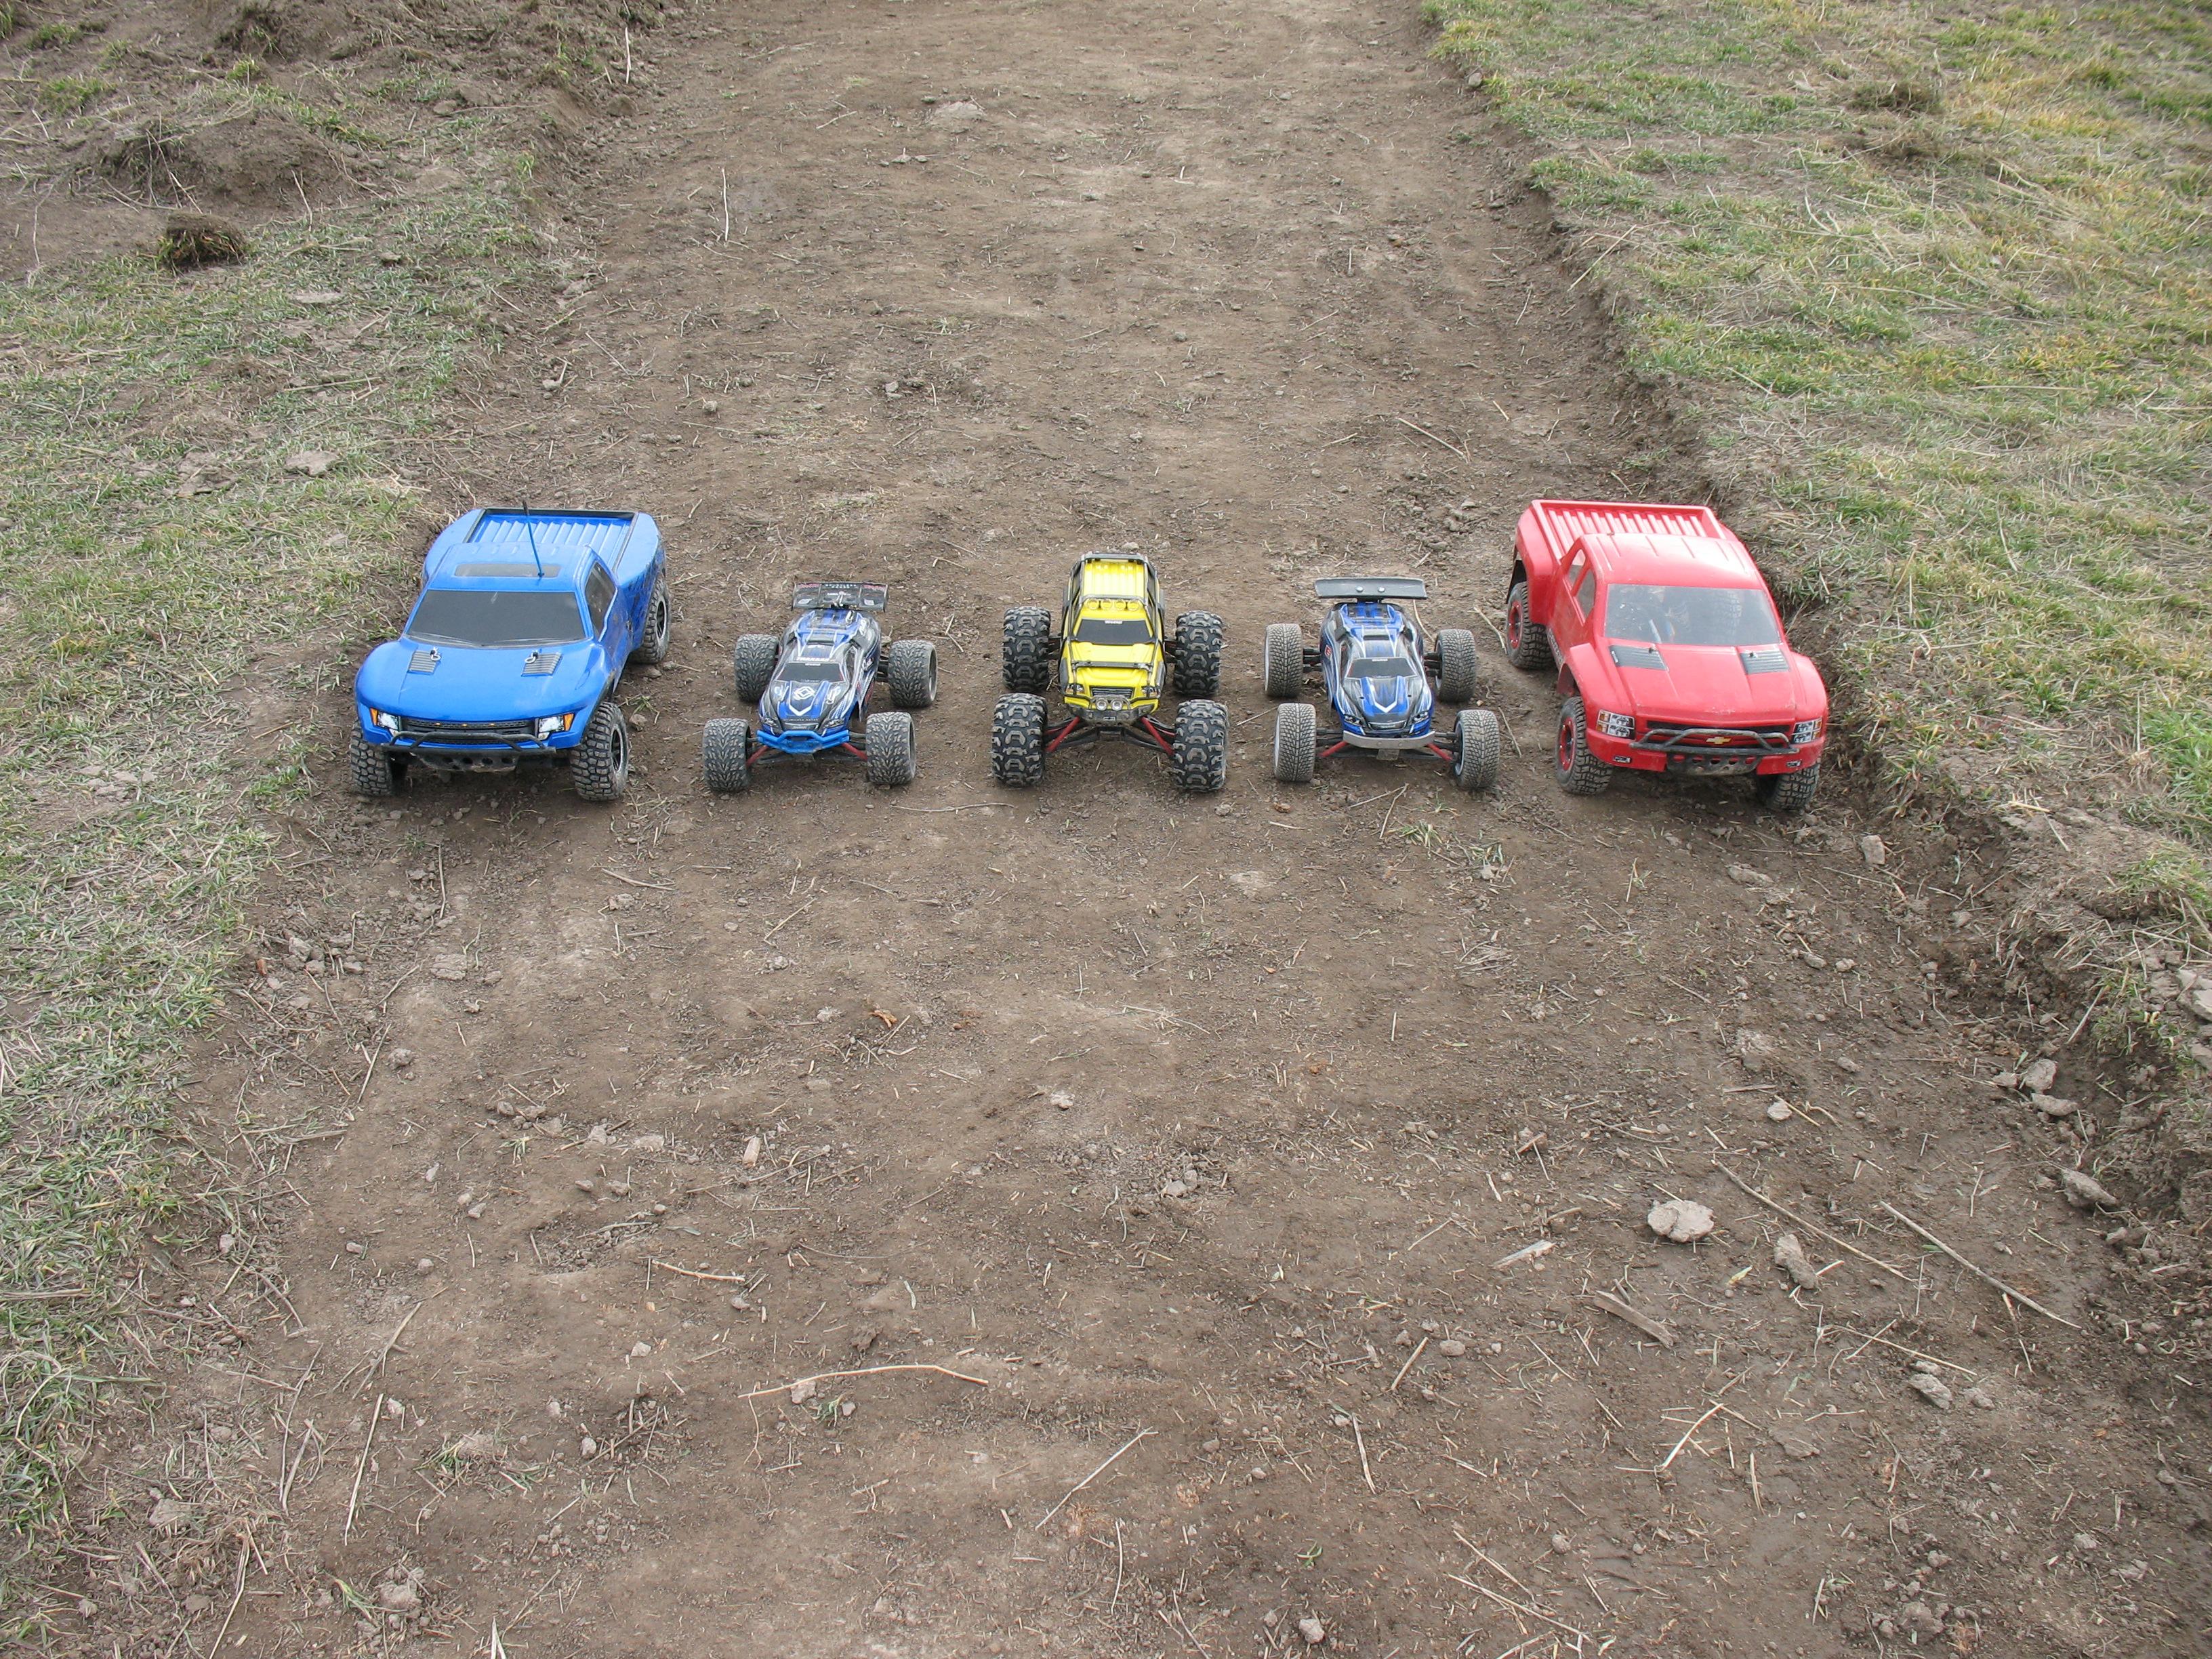 Rc Car Track: Our Home Made RC Car Track!